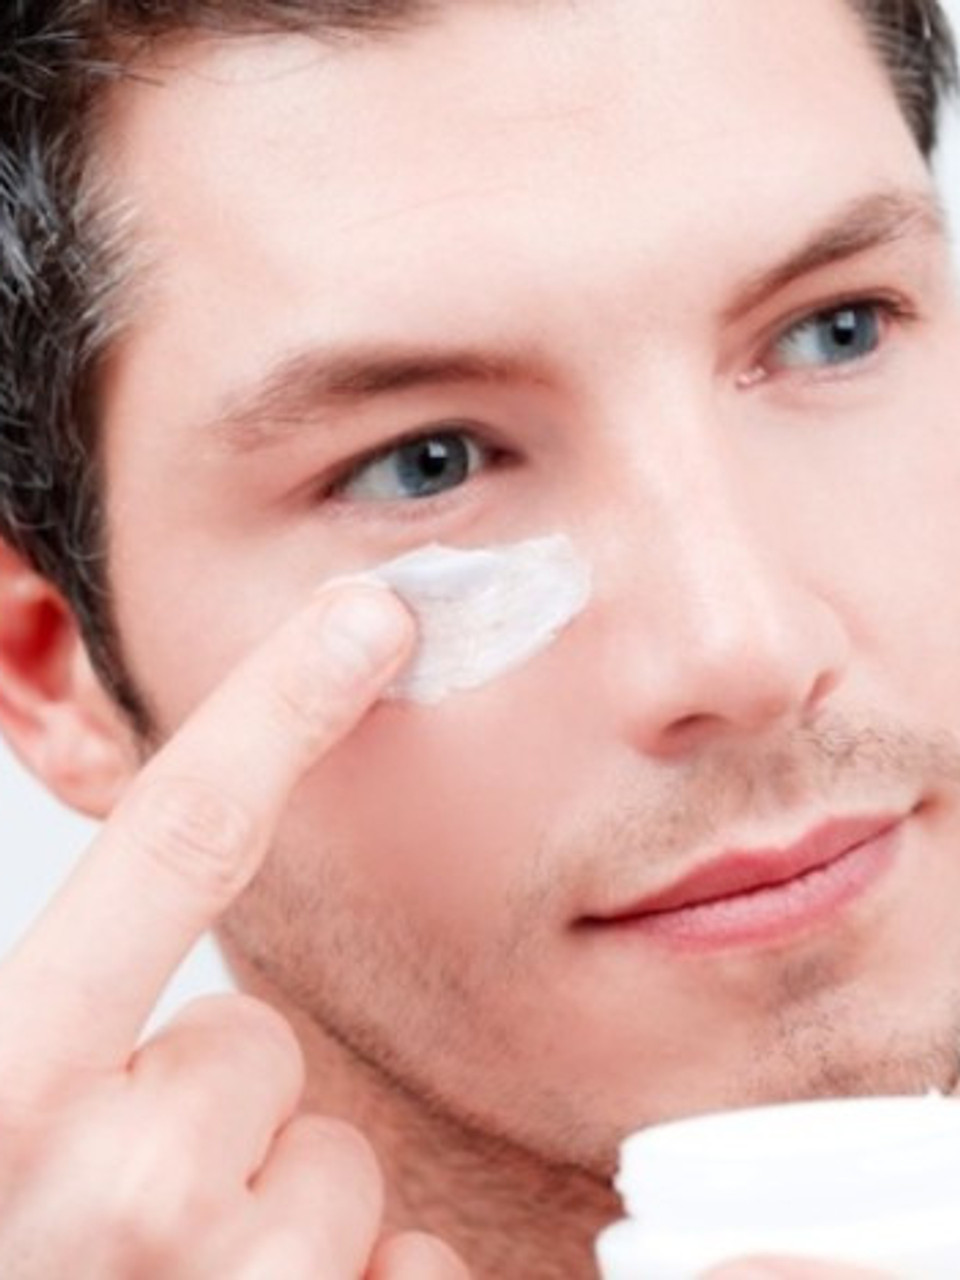 Mens eye contour